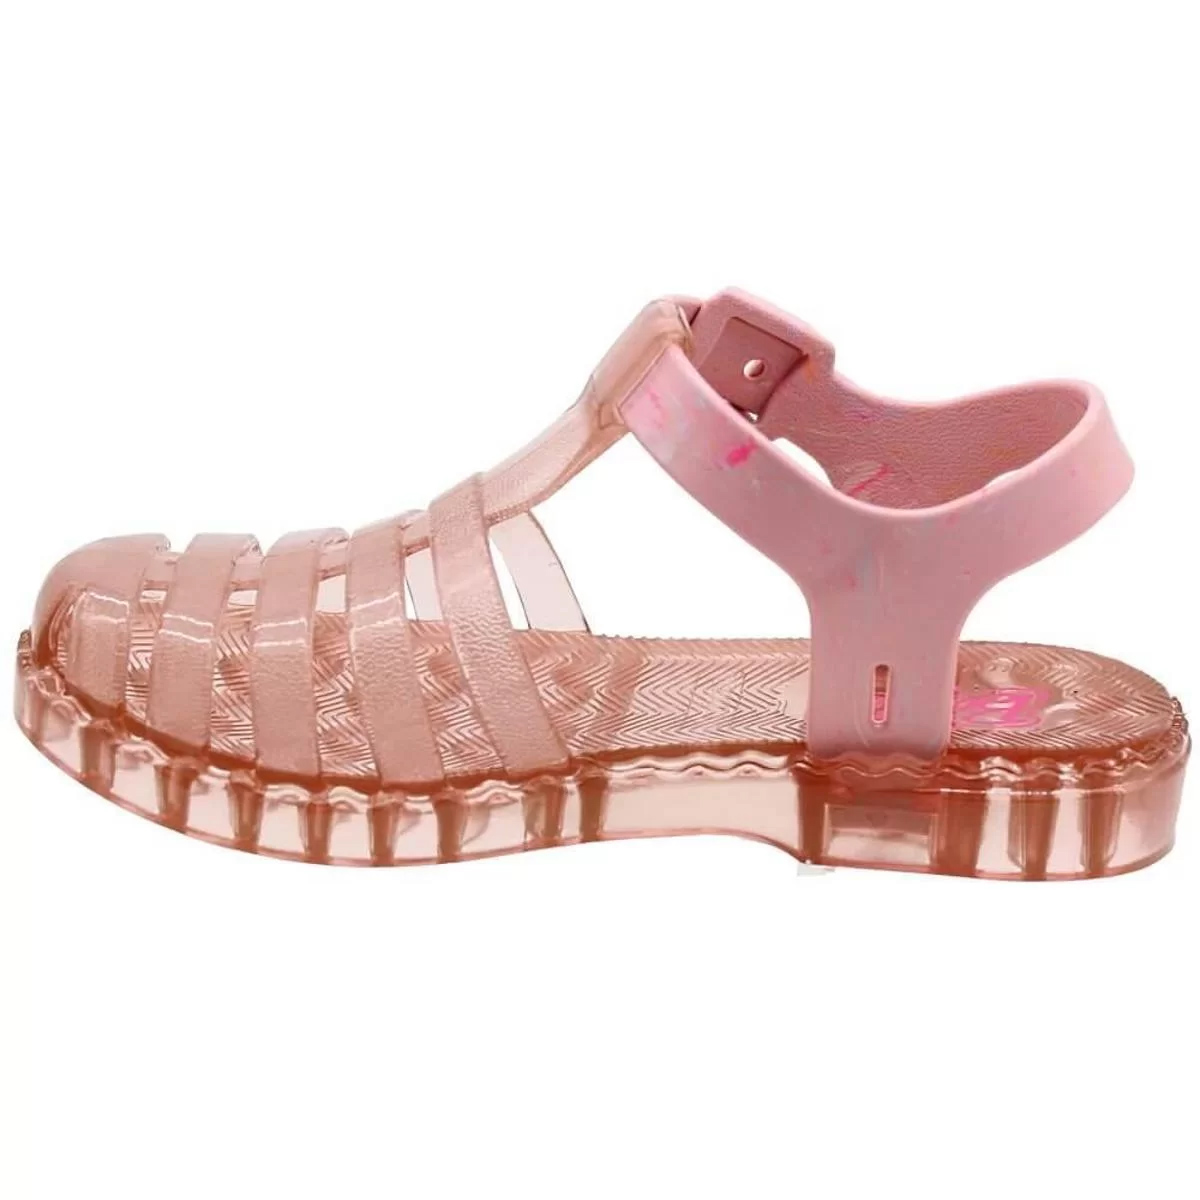 Sandalia Grendene Feminina Barbie Rosa